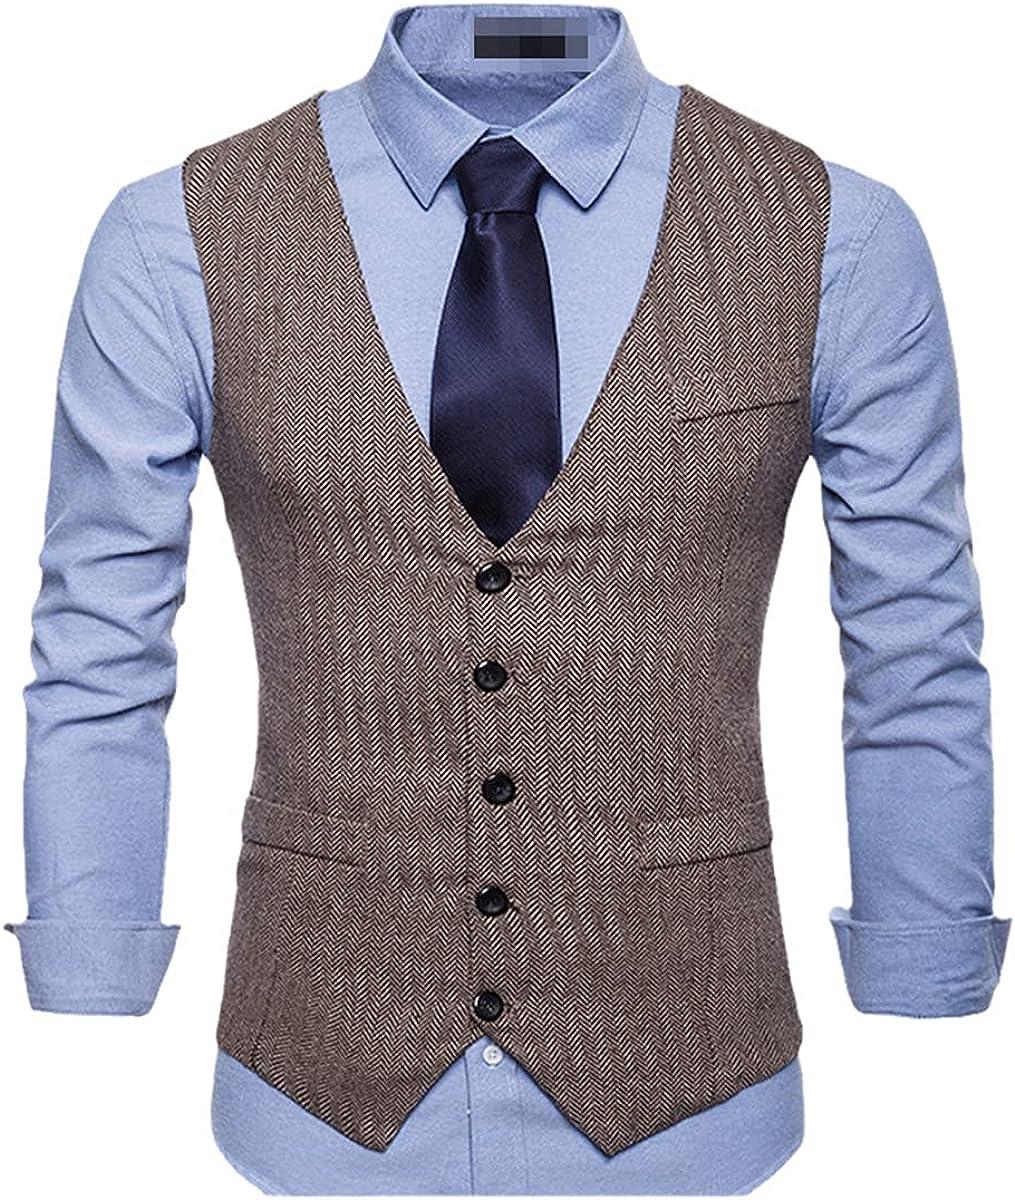 Fashion suit vest men's formal vest herringbone vest fitness sleeveless jacket wedding vest